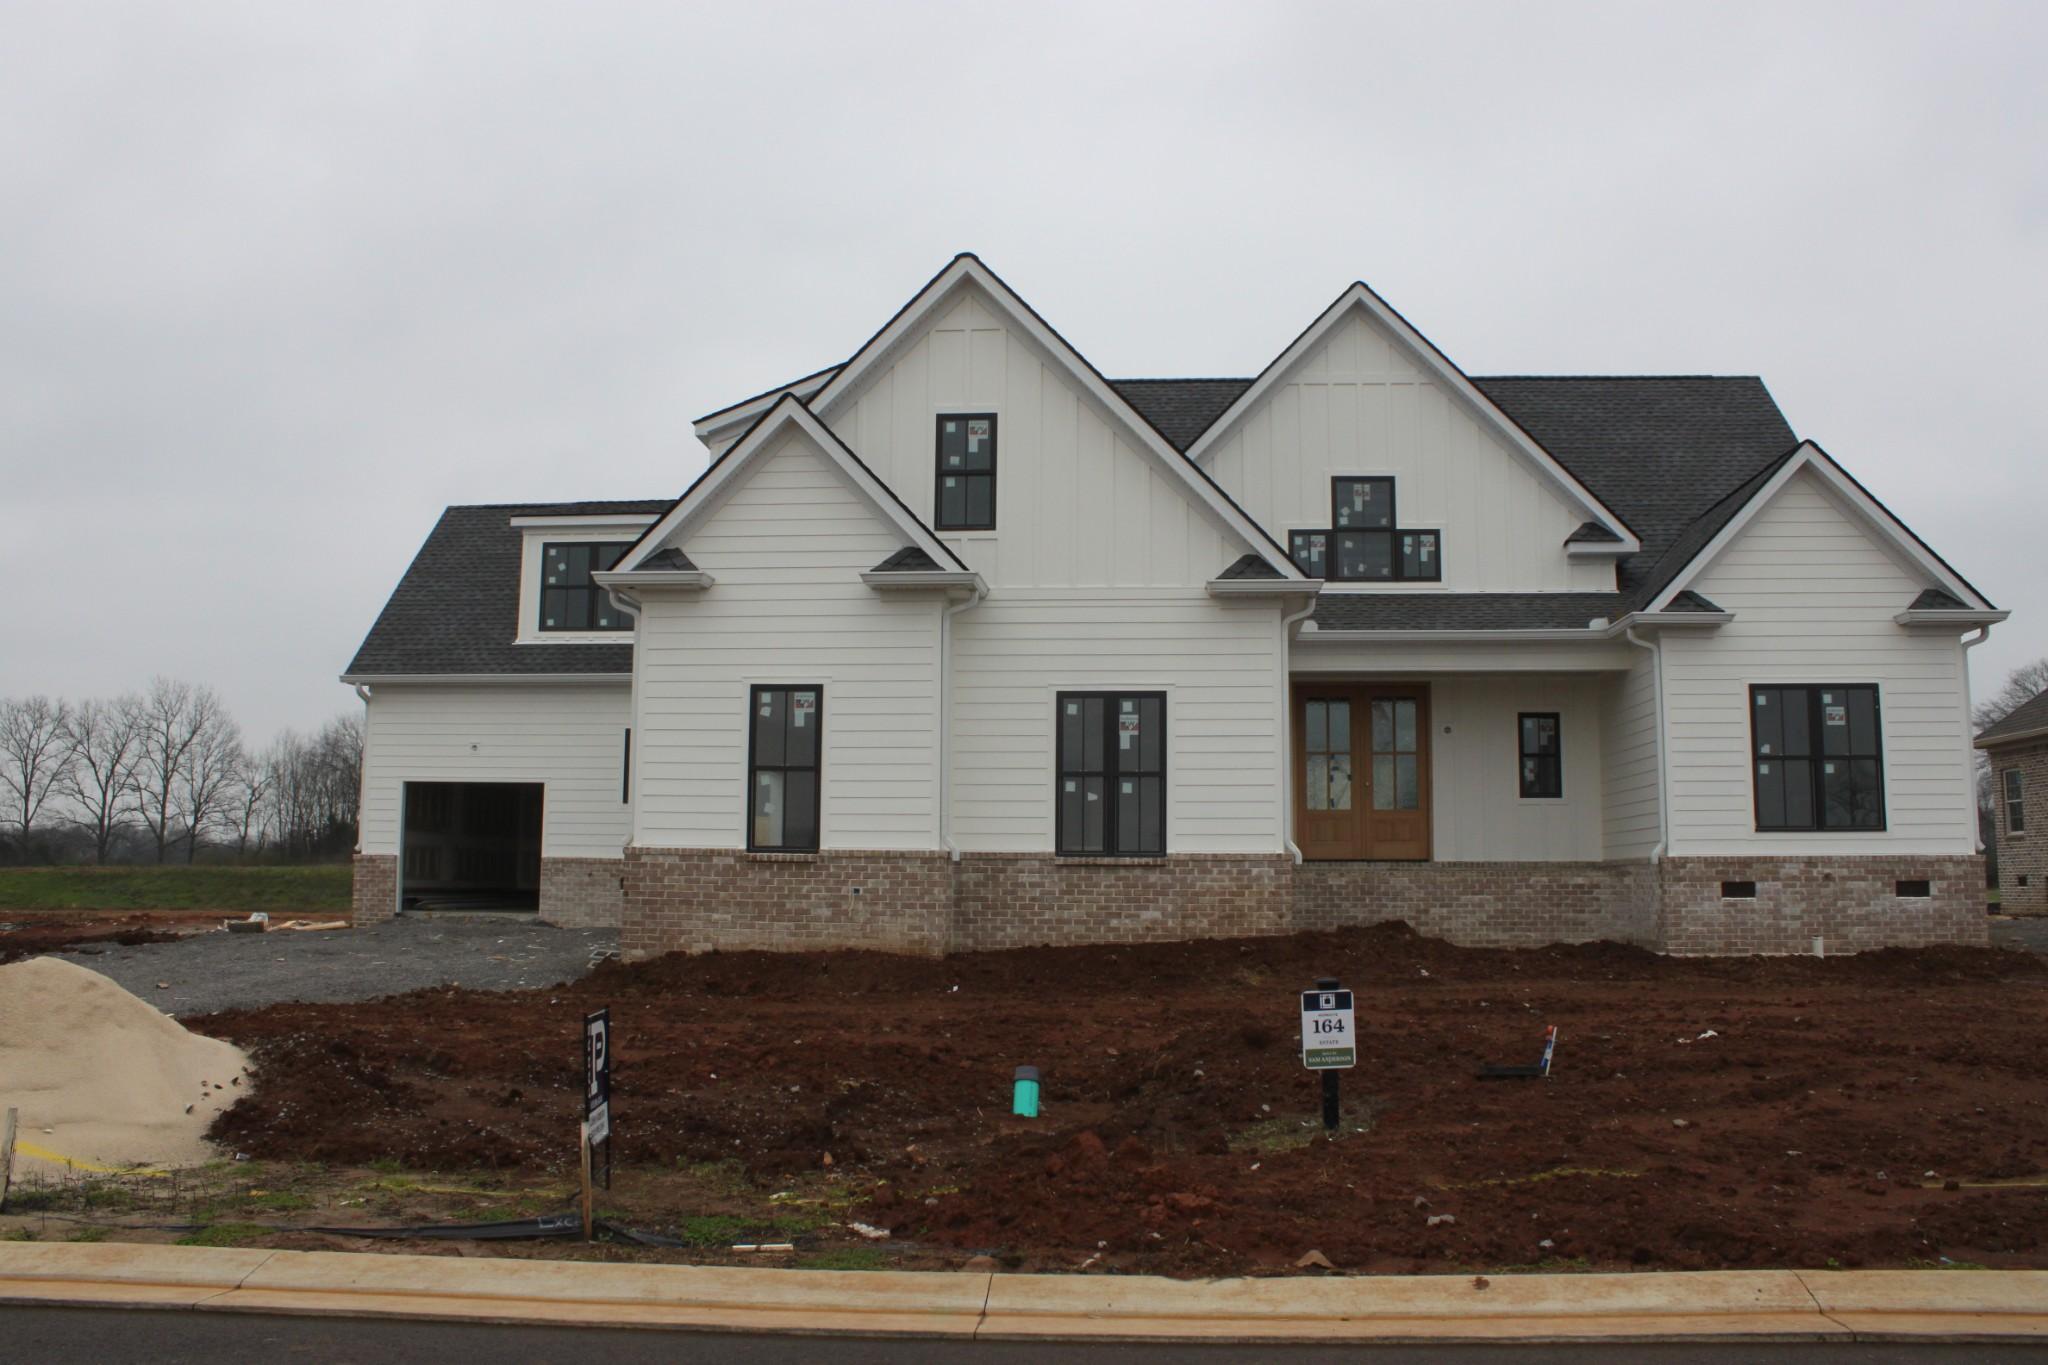 5619 Bridgemore Blvd, Murfreesboro, TN 37128 - Murfreesboro, TN real estate listing